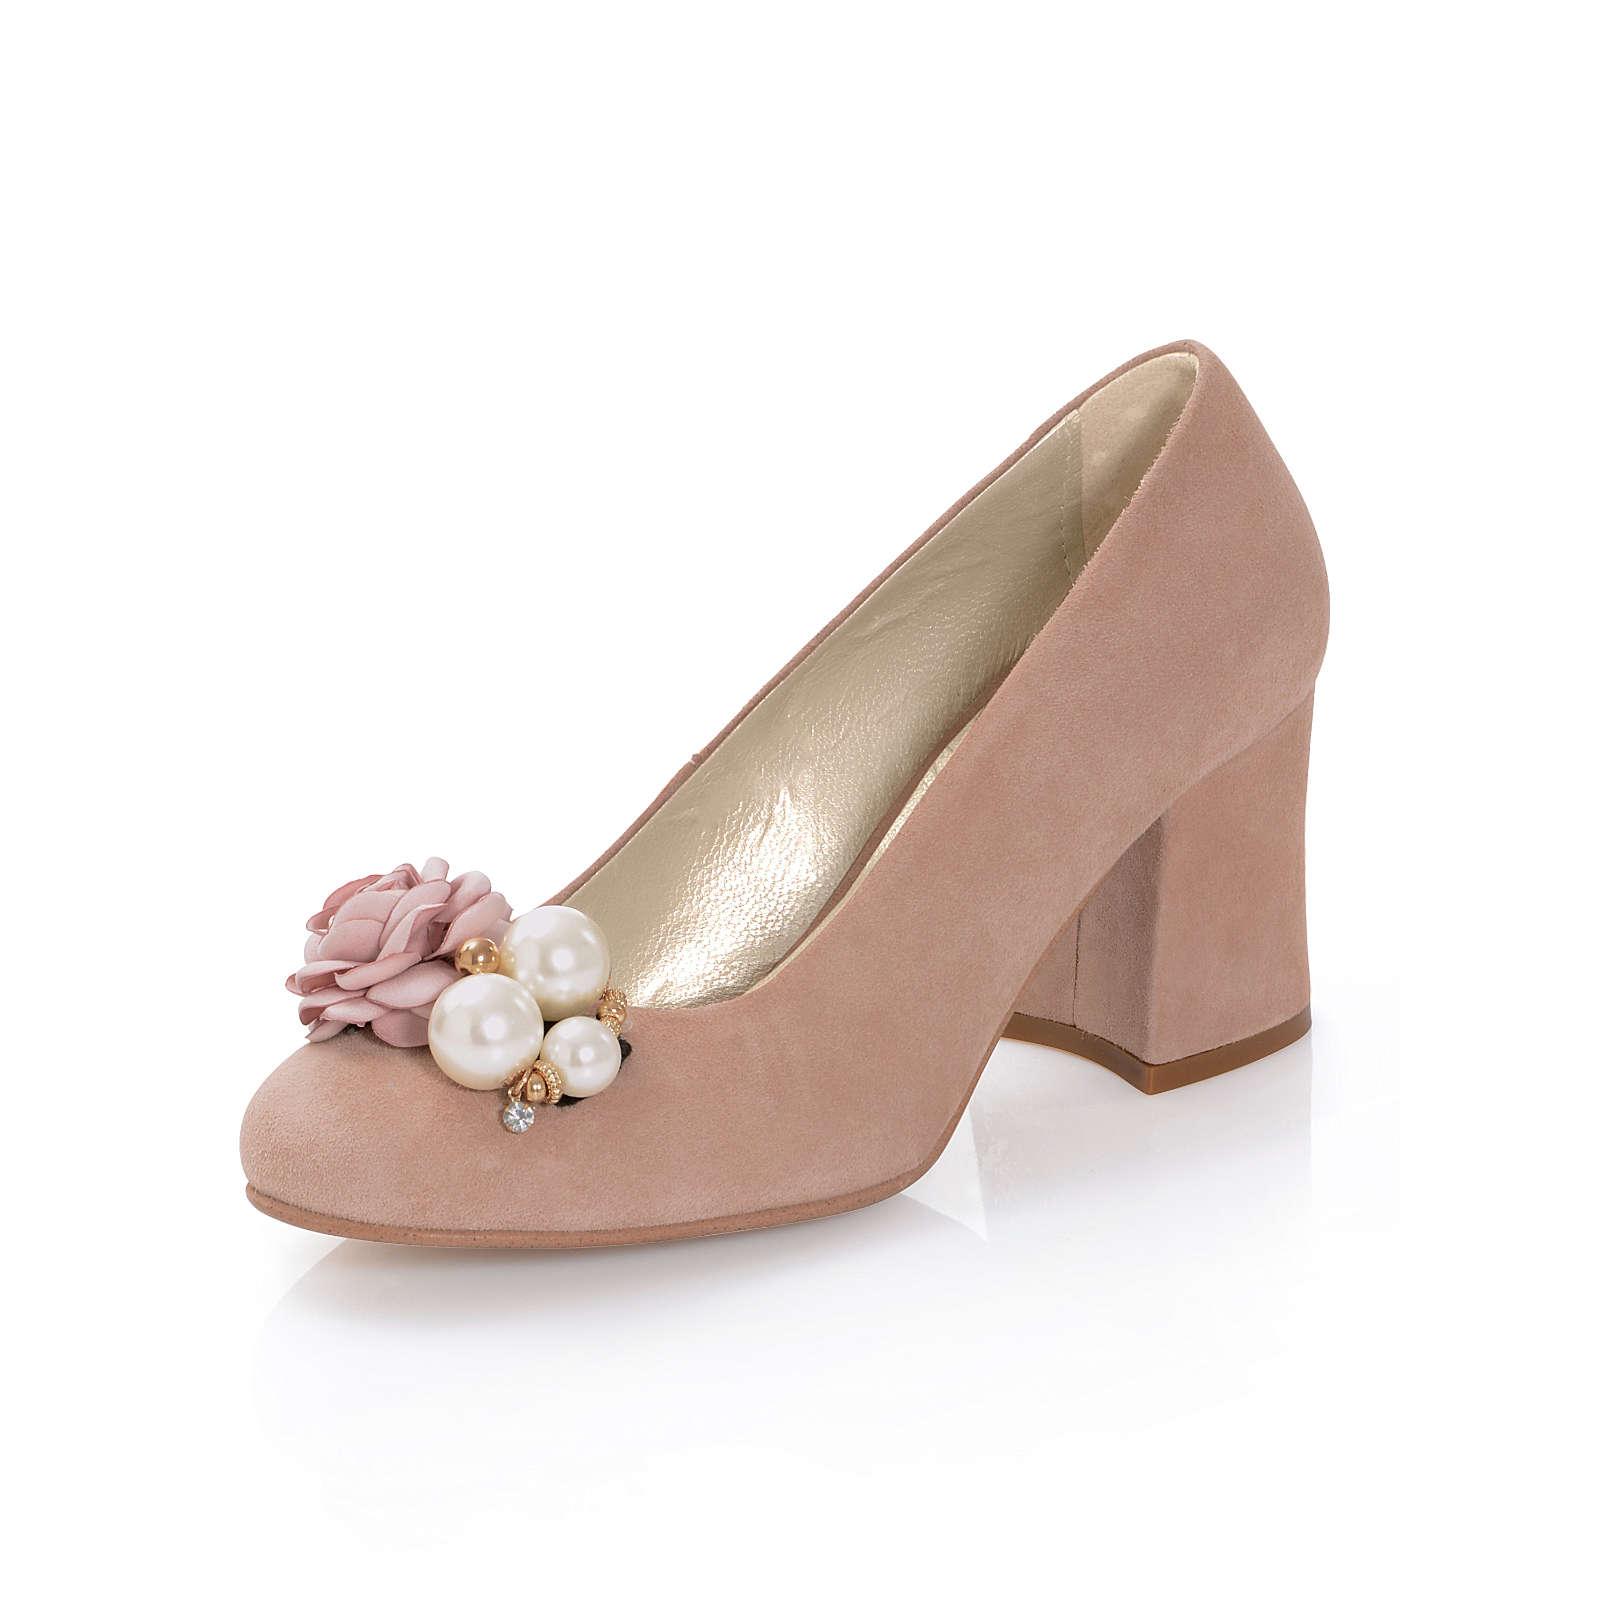 Alba Moda Pumps rosa Damen Gr. 38